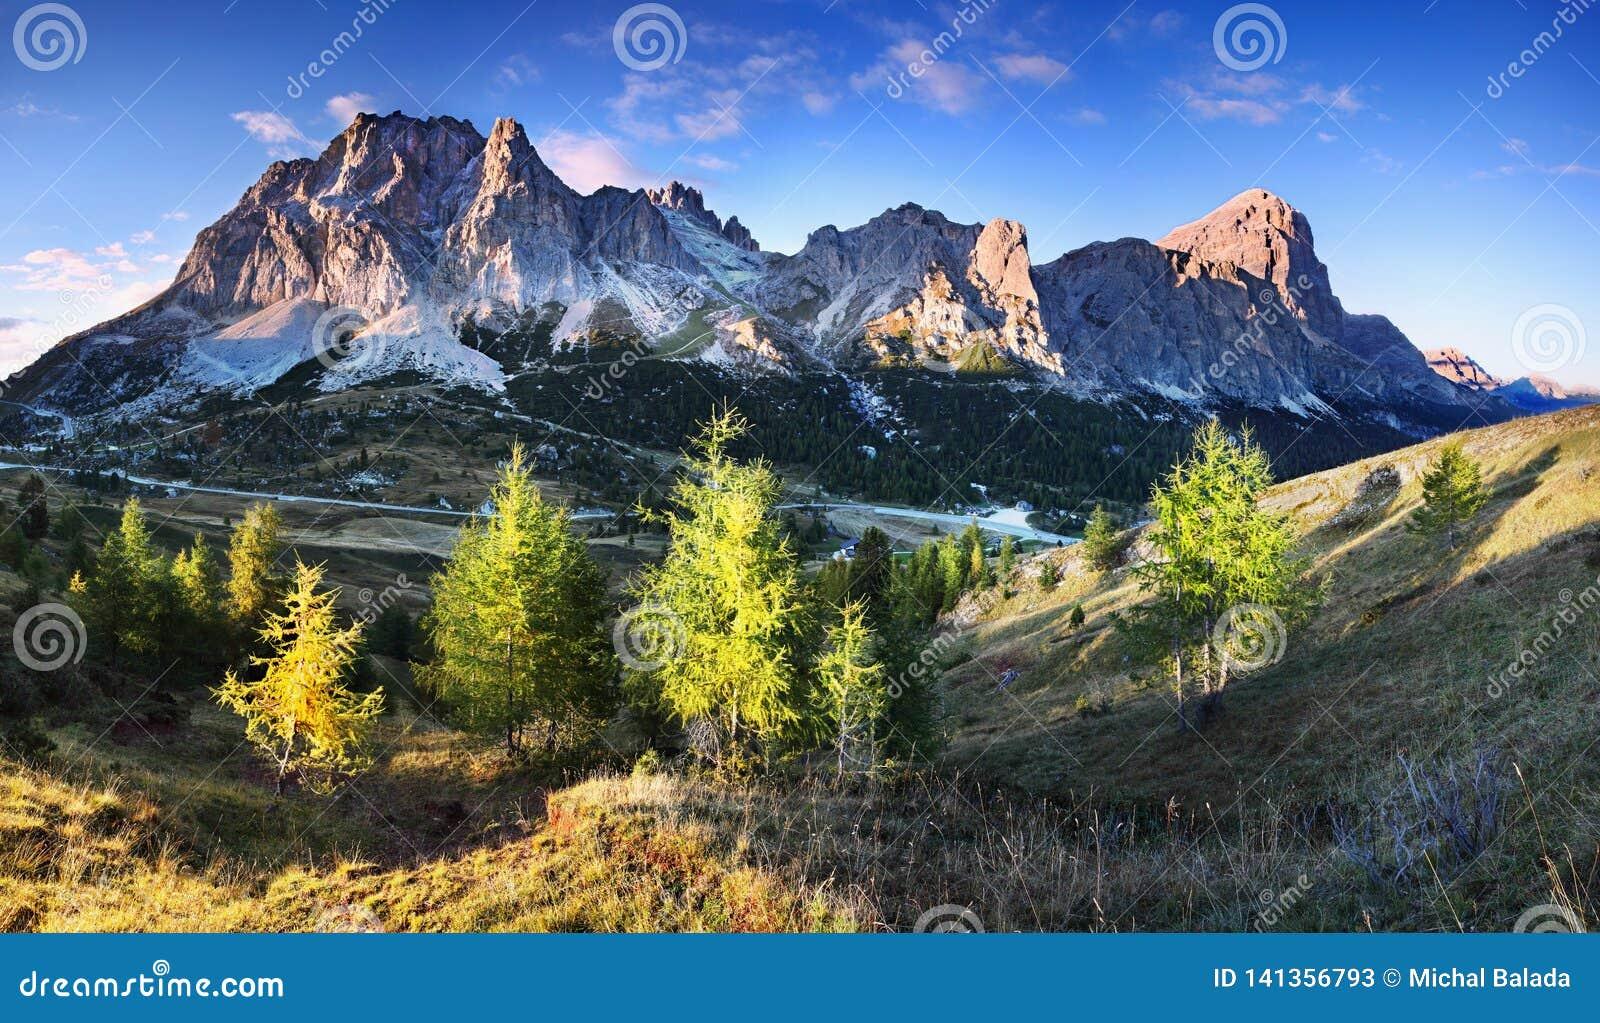 Arête de montagne de Cortina r r